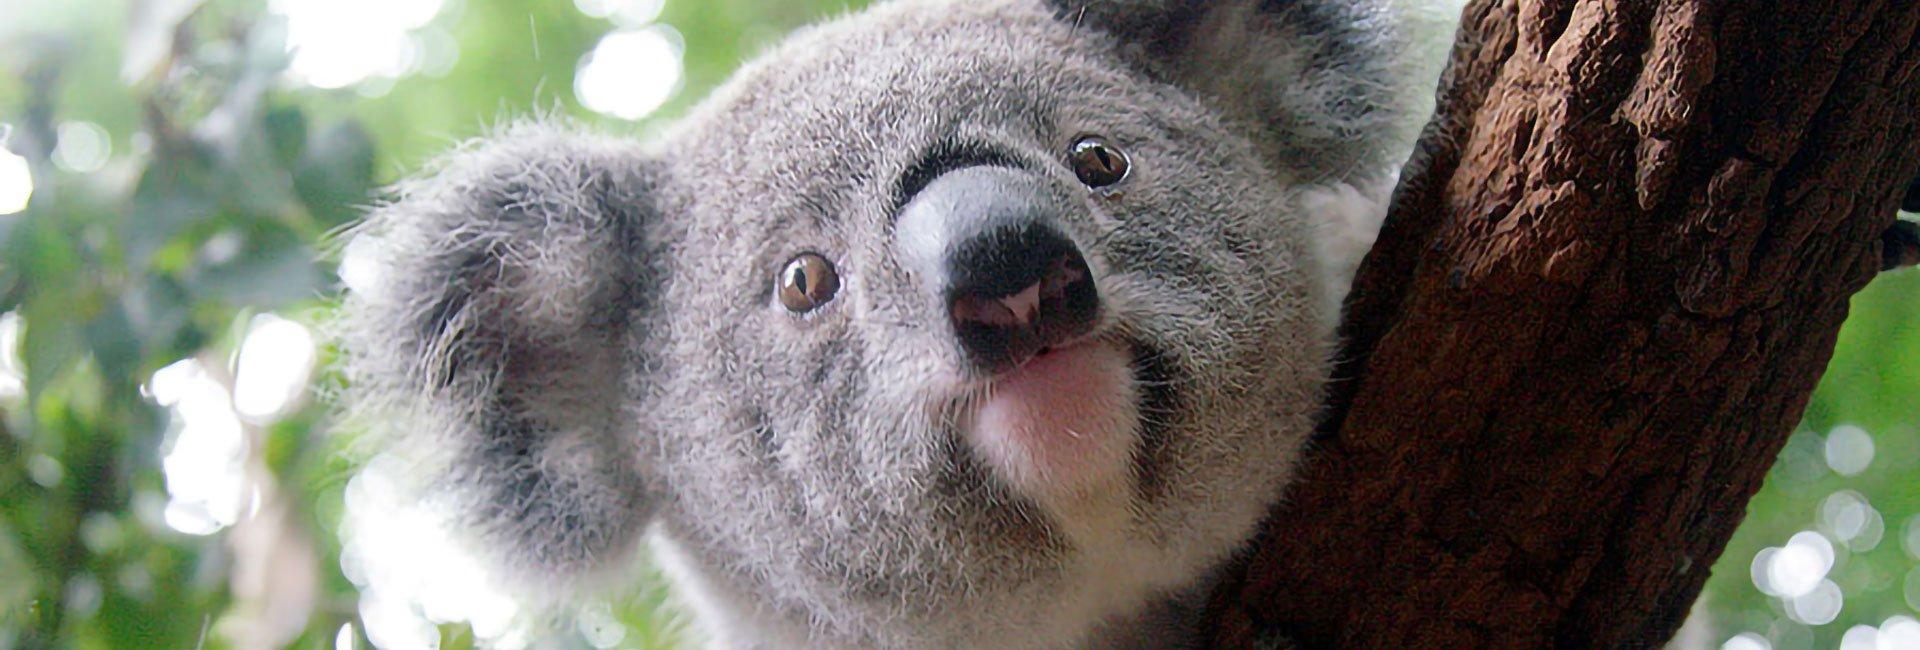 koala_joey-banner